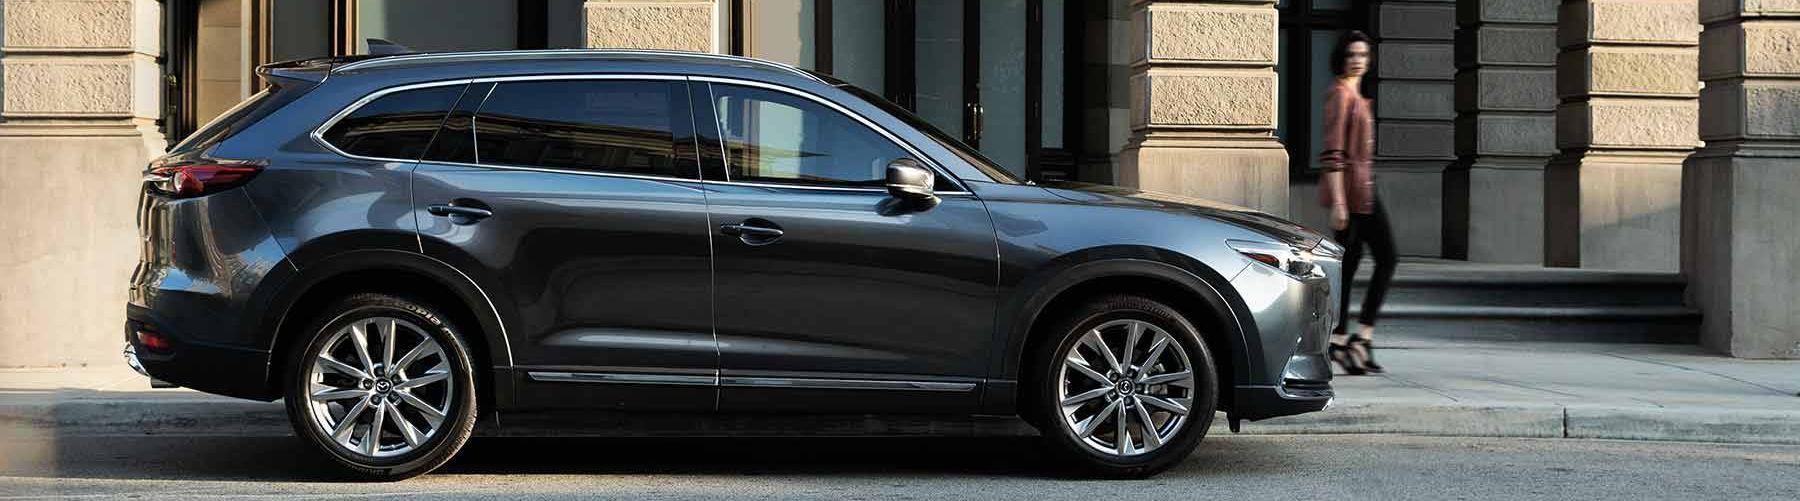 2019 Mazda CX-9 for Sale near Kingsport, TN